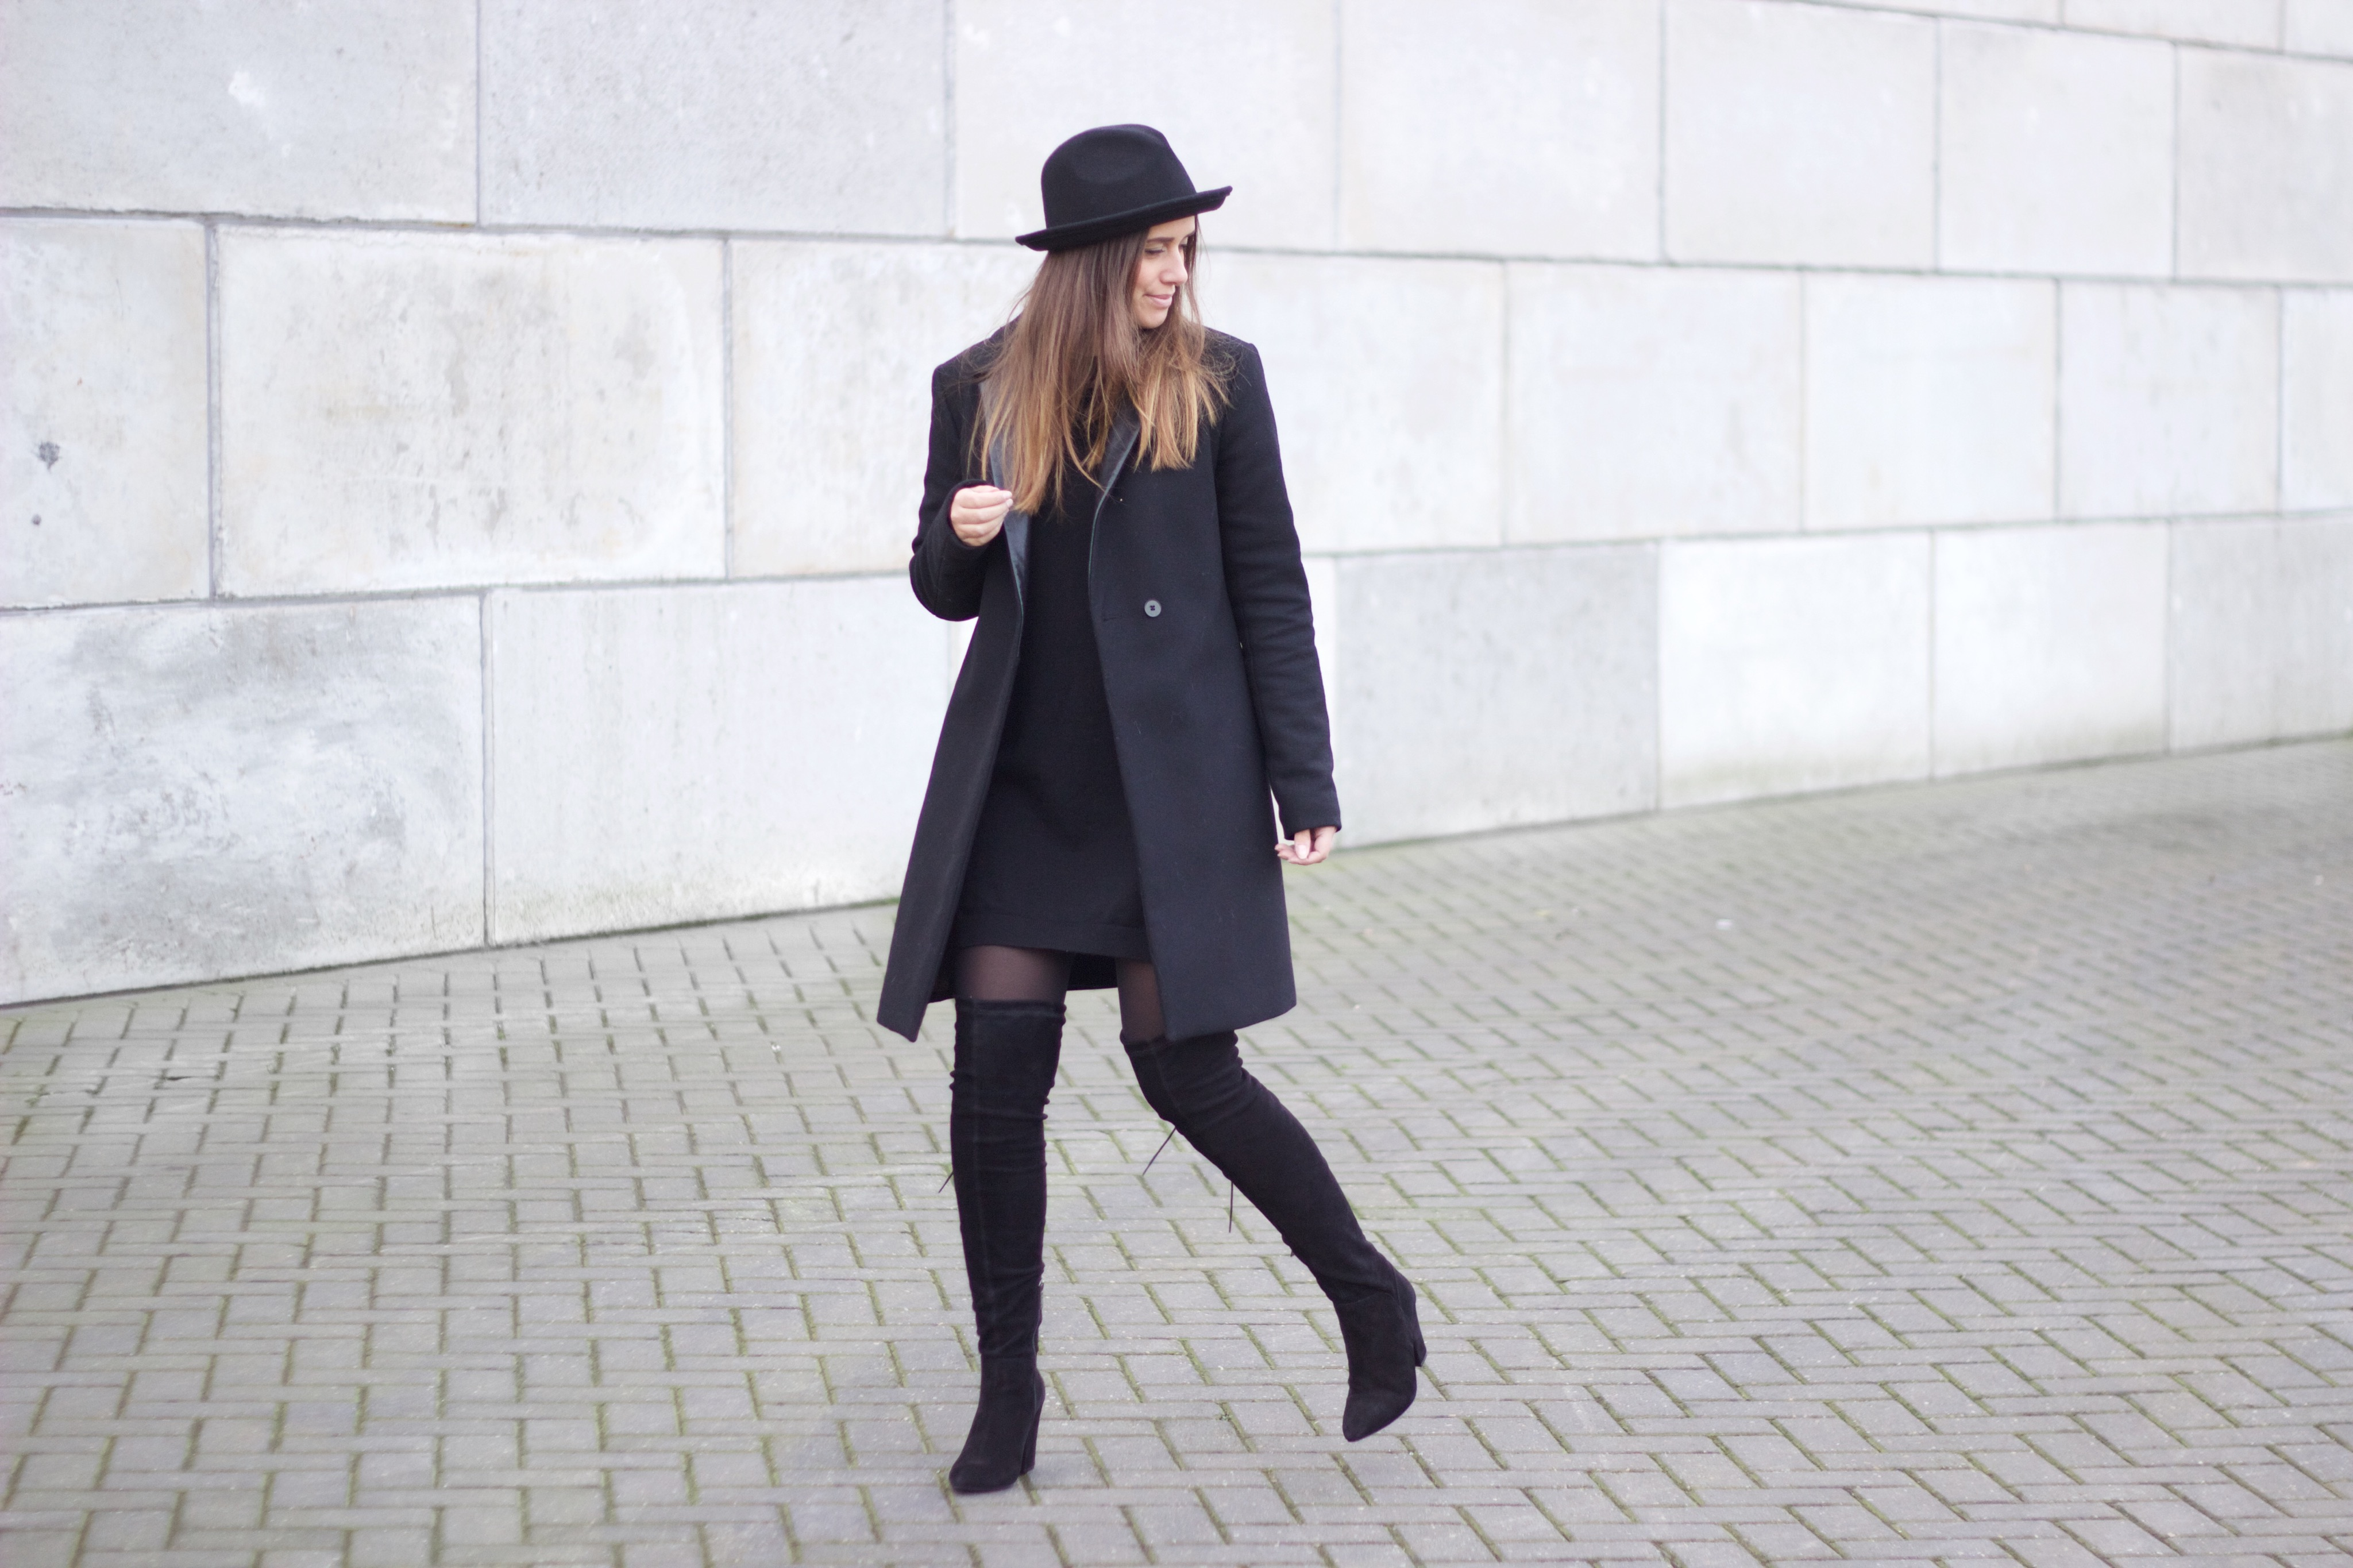 Long-coat-simplicity-all-black-monochrome